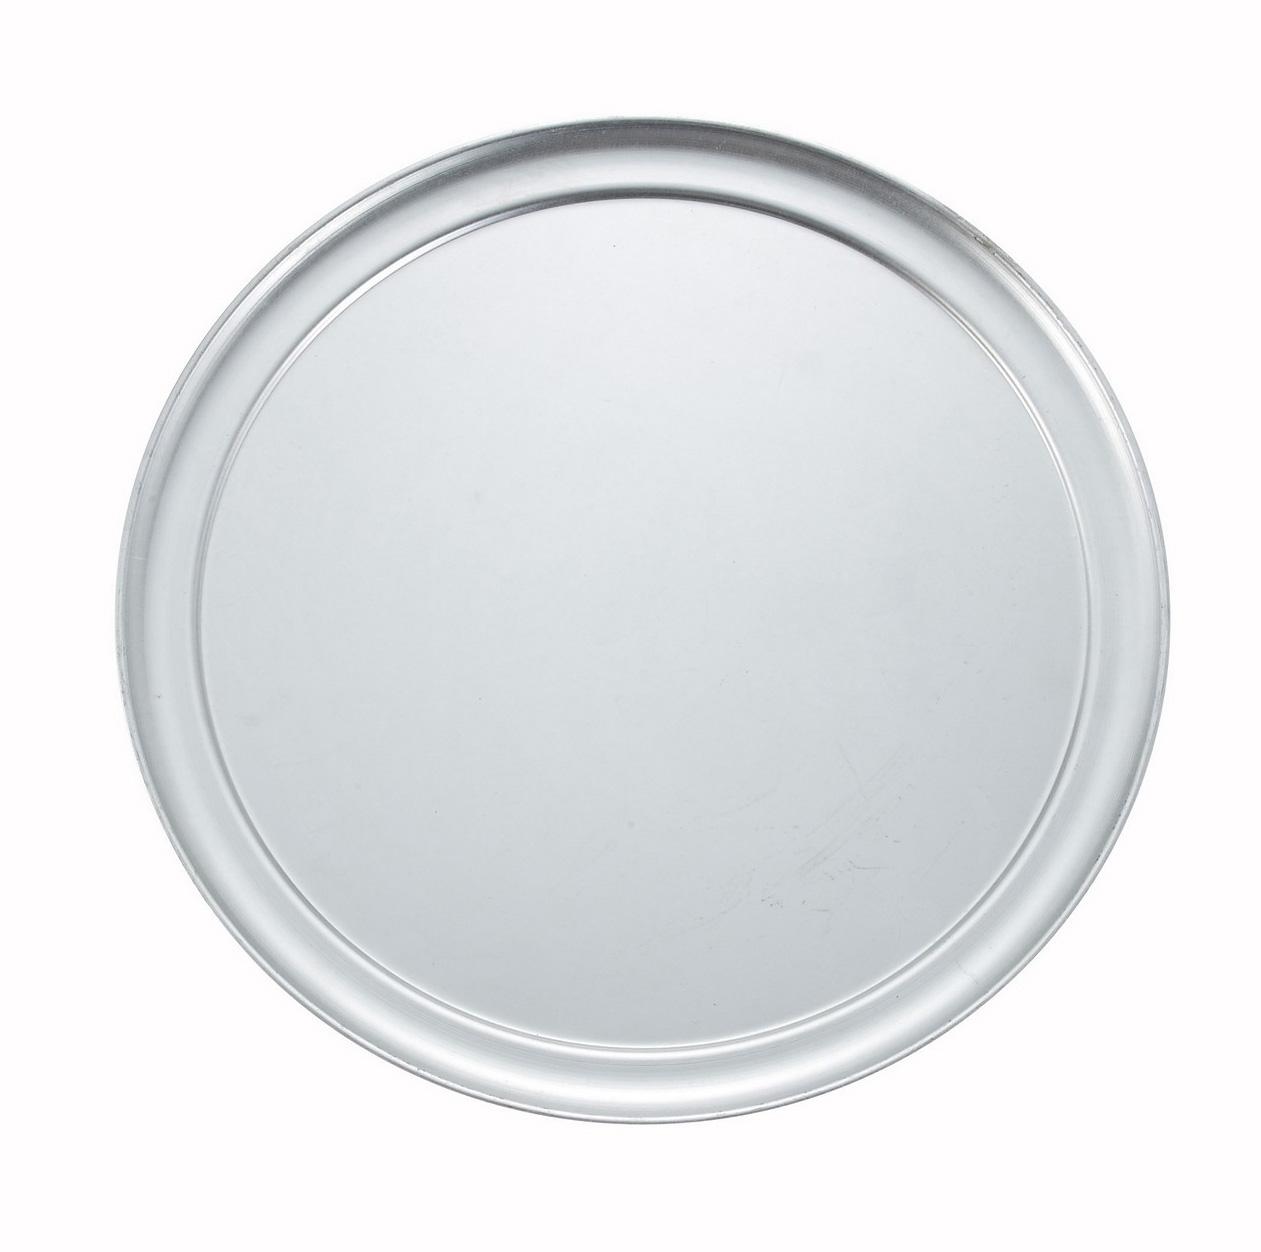 Winco APZT-16 16-Inch Wide-Rimmed Aluminum Pizza Pan